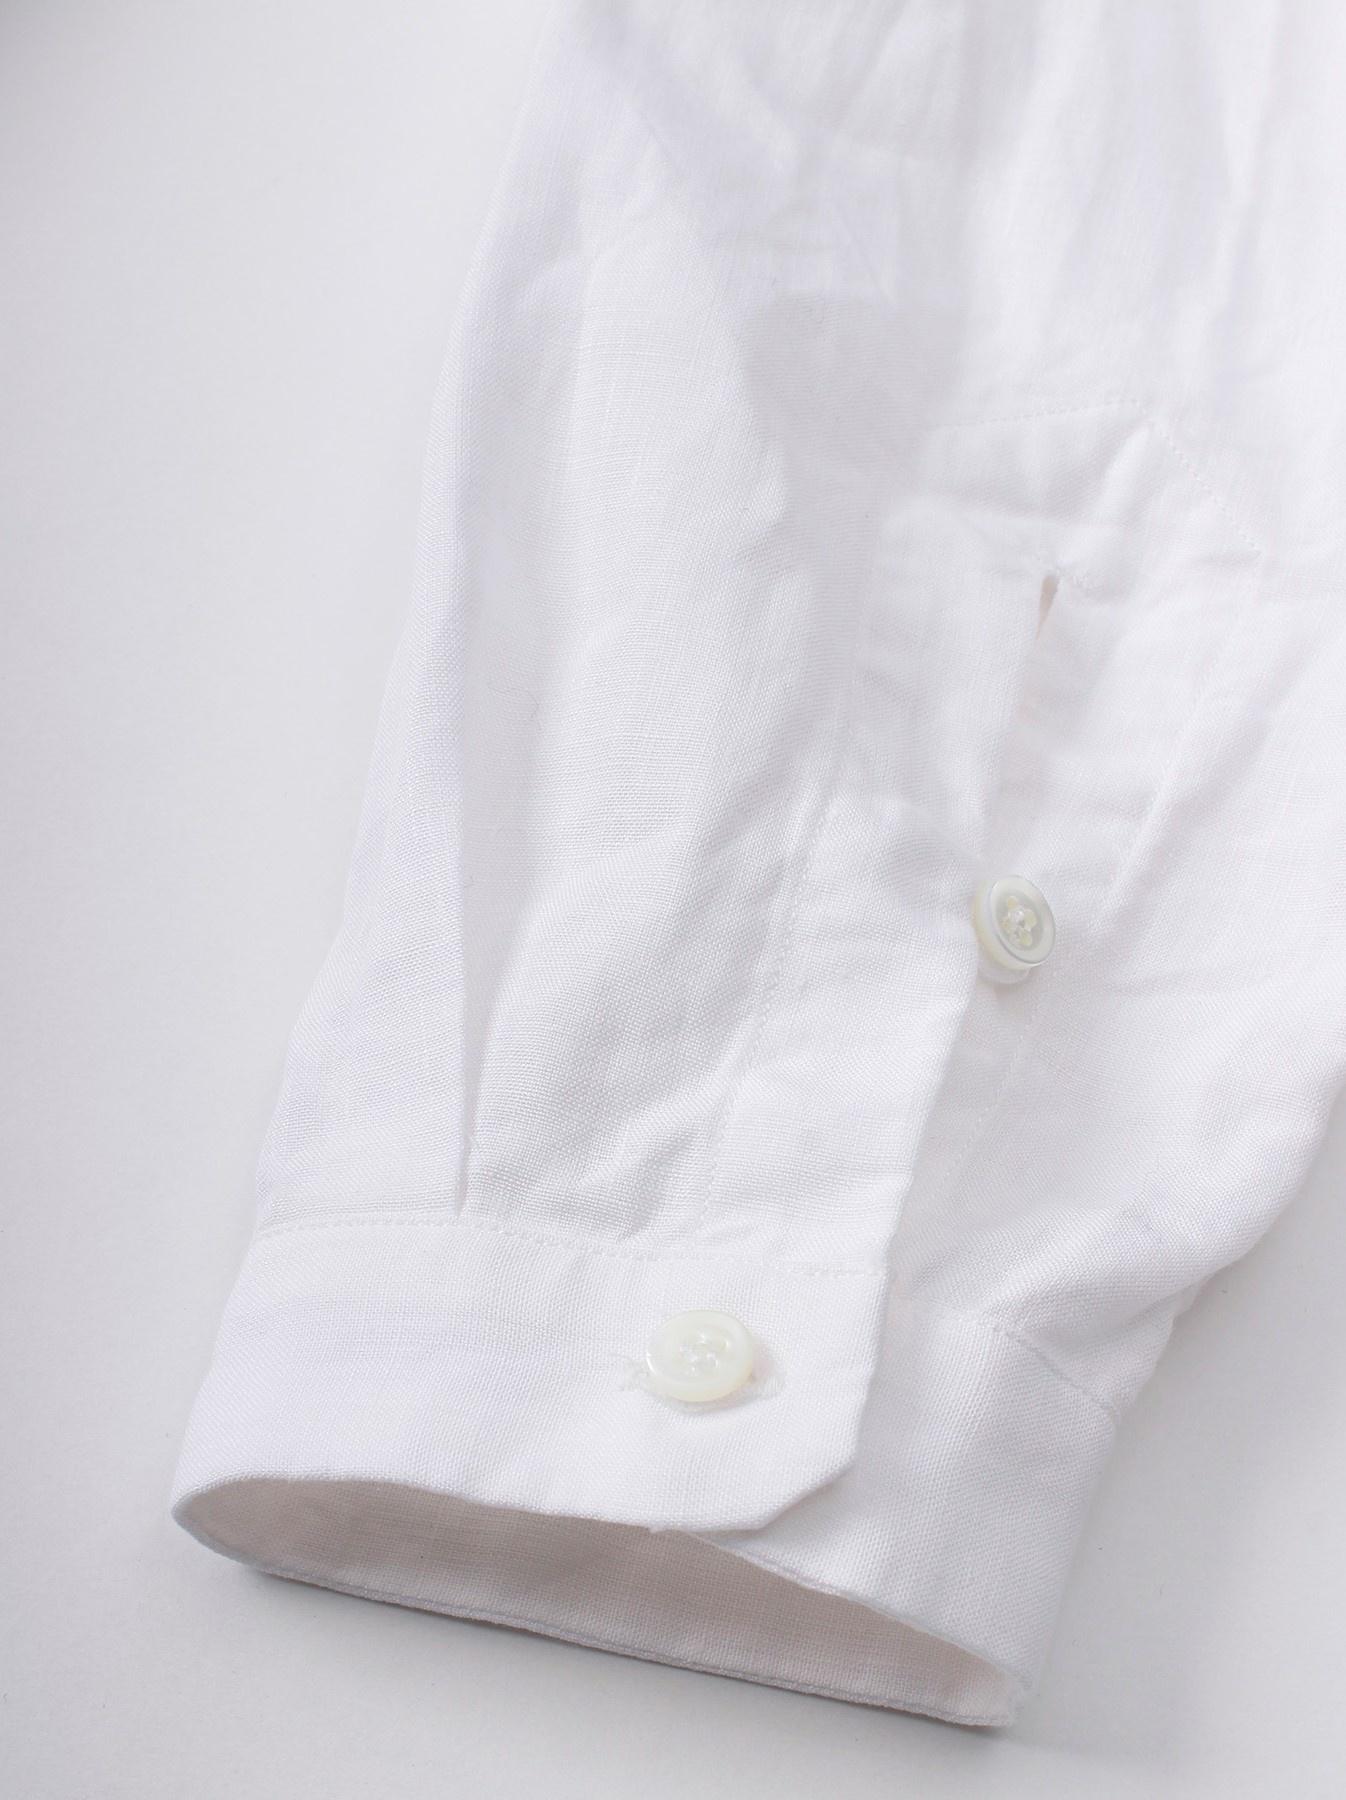 WH Piece-dyed Linen 908 Safari Shirt-3